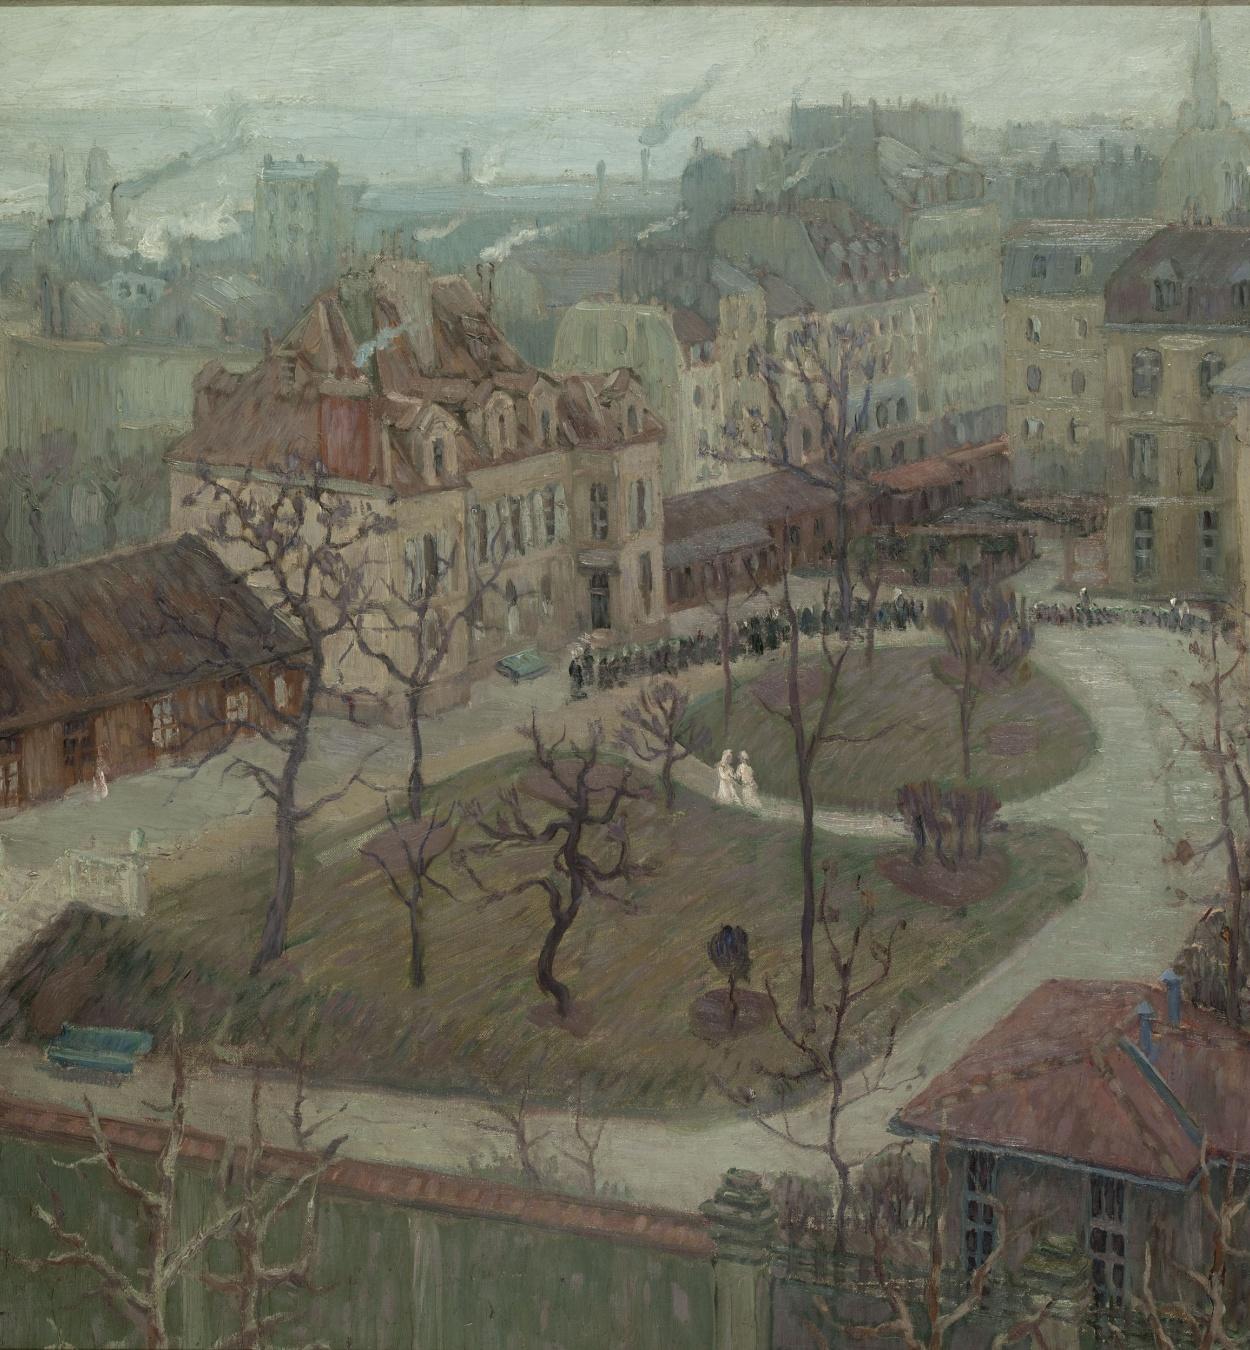 Marià Pidelaserra - Bird's-eye View of a Hospital Courtyard (Winter: grey day) - Paris, 1900